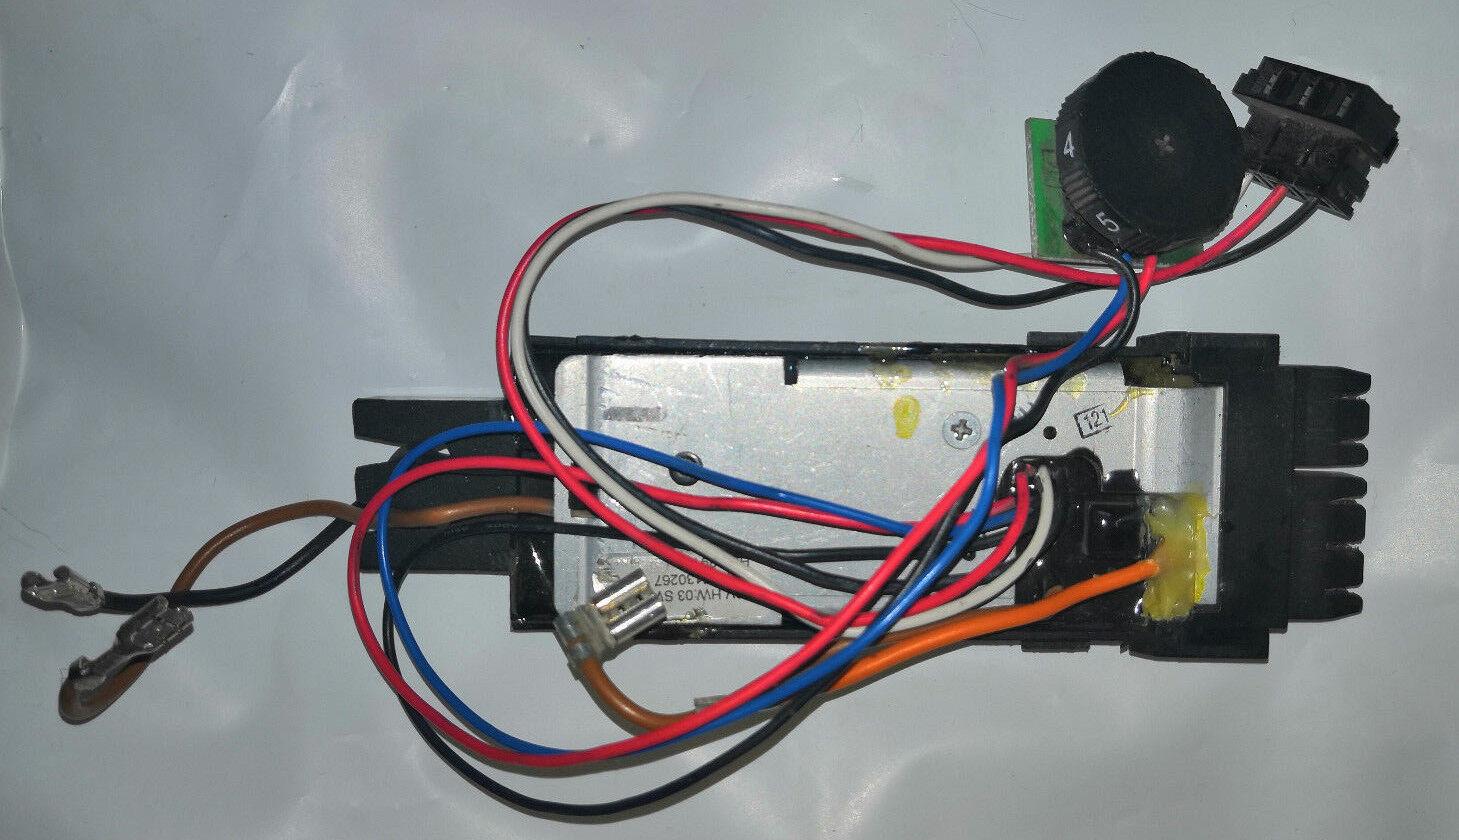 Hilti WSR 36  Steuerelektronik, gebraucht, original Elektronik, Drehzahlregler